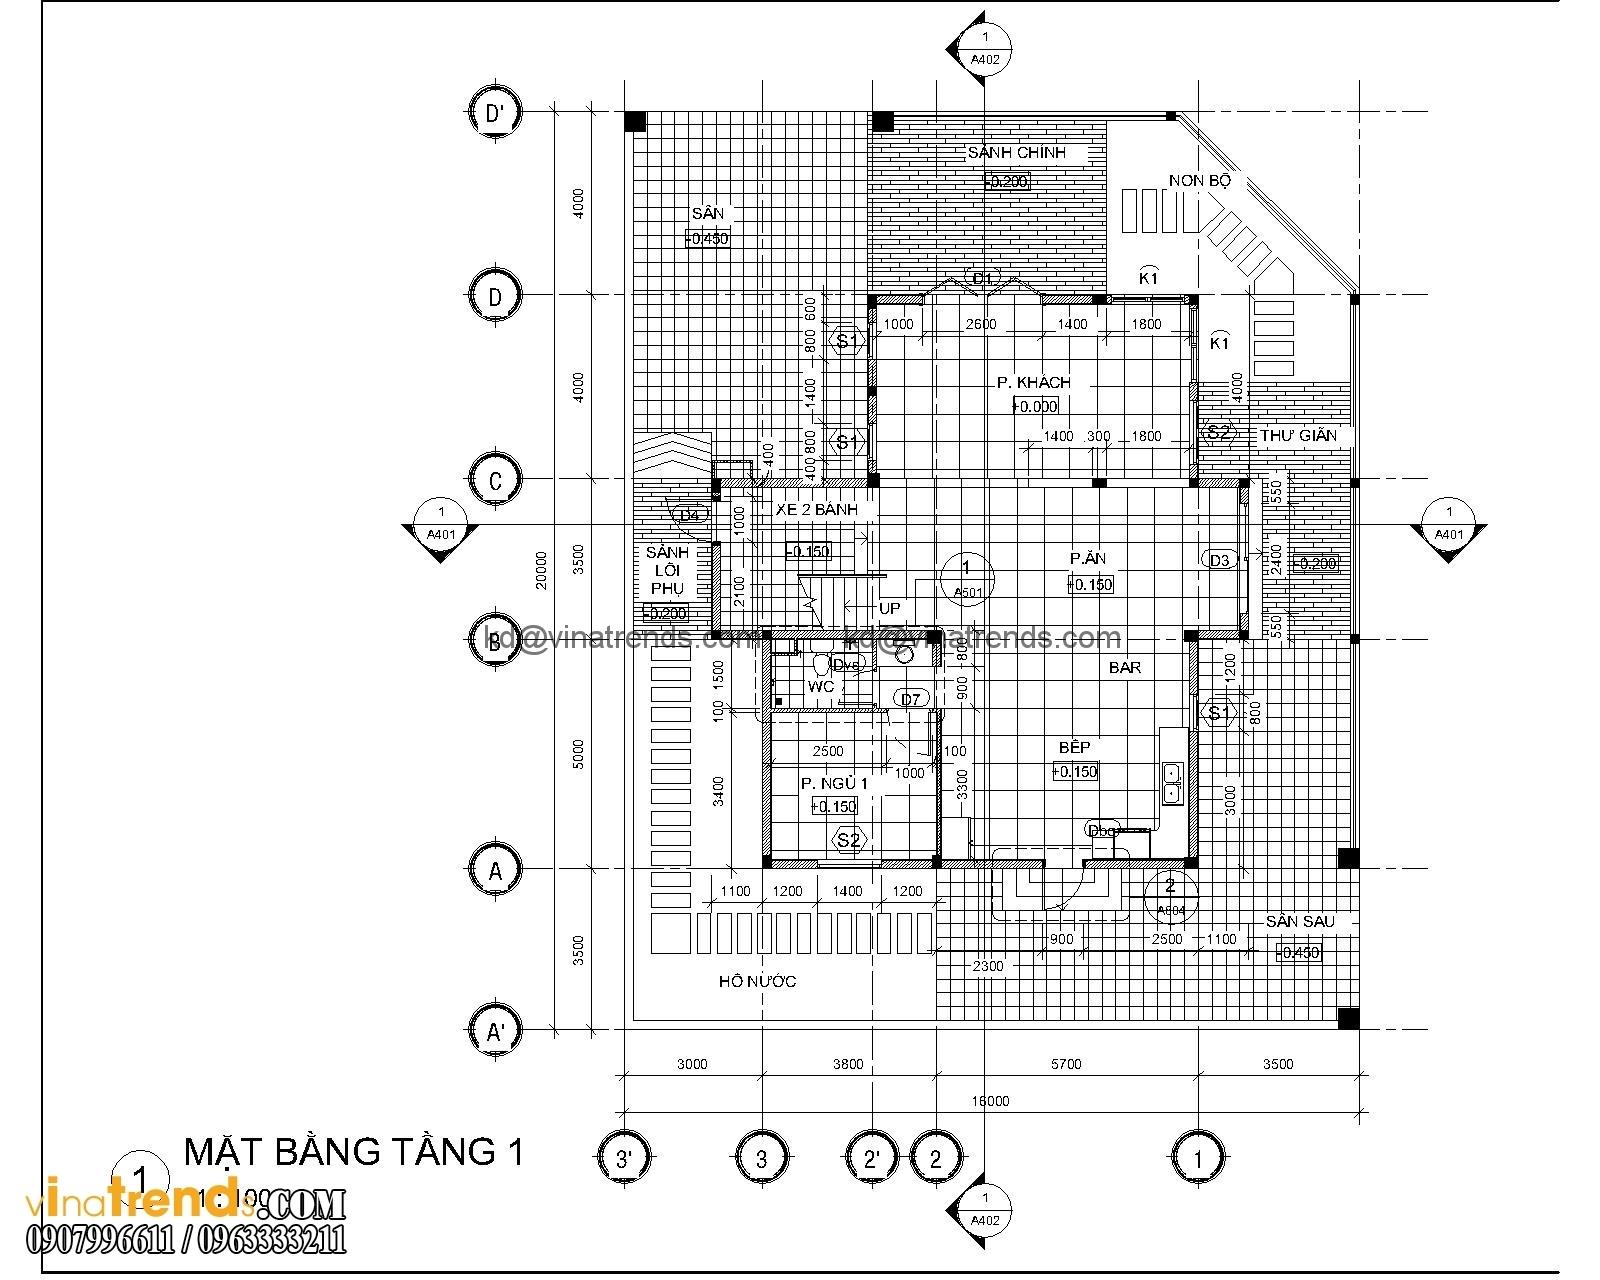 mat bang biet thu hien dai 3 tang 18x20m (6)